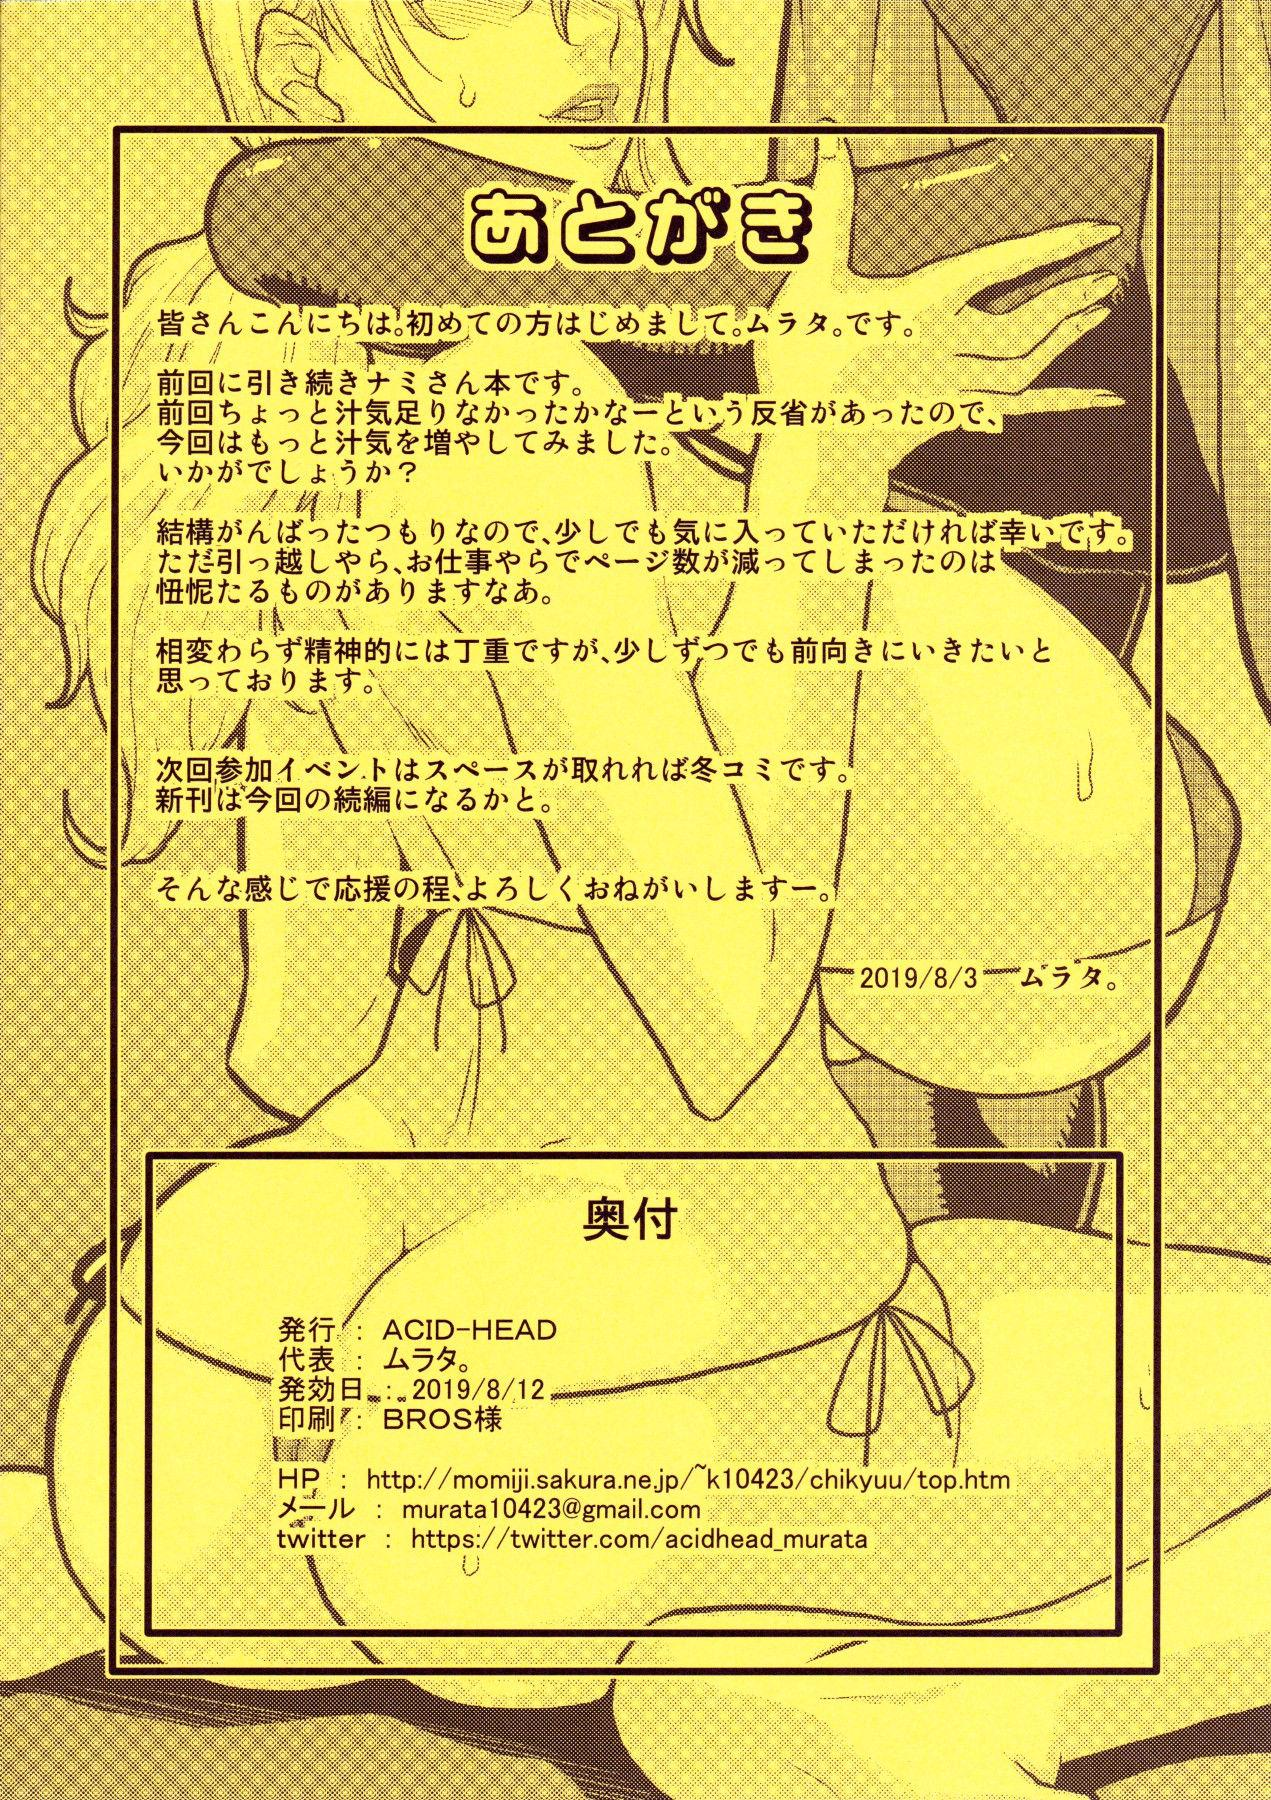 (C96) [ACID-HEAD (Murata.)] Nami Ura 14 Nami-san VS Kyokon Shiru Danyuu | Nami-san VS A Guy With A Large Cock Dripping With Precum (One Piece) [English] {Doujins.com} 13